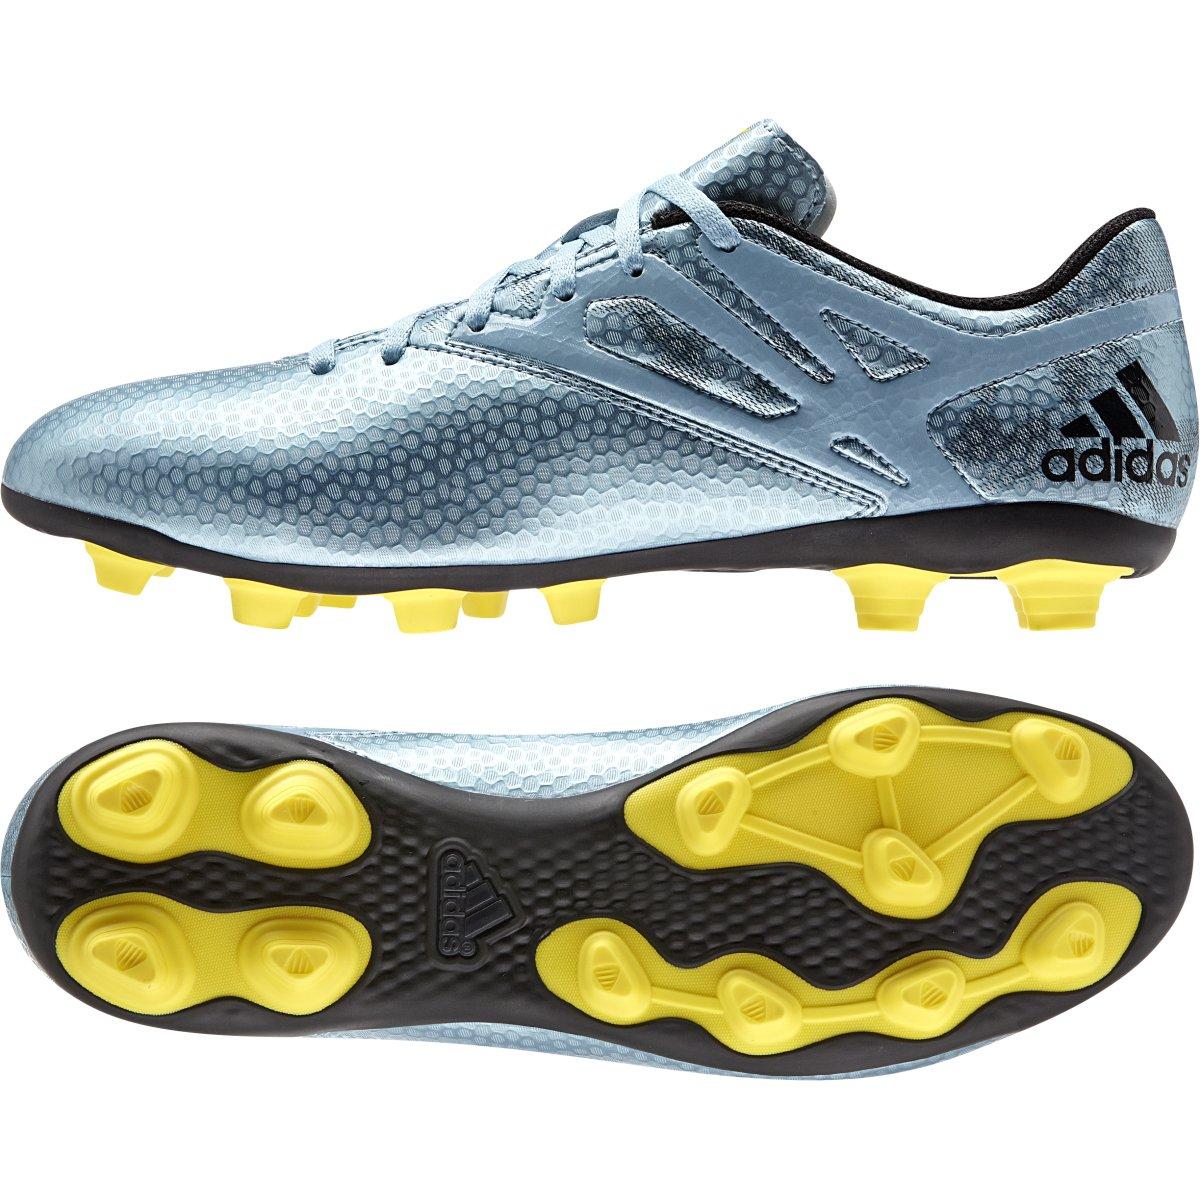 Chuteira Adidas Messi 15.4 FG Campo - Compre Agora  3c46fbe45e57d